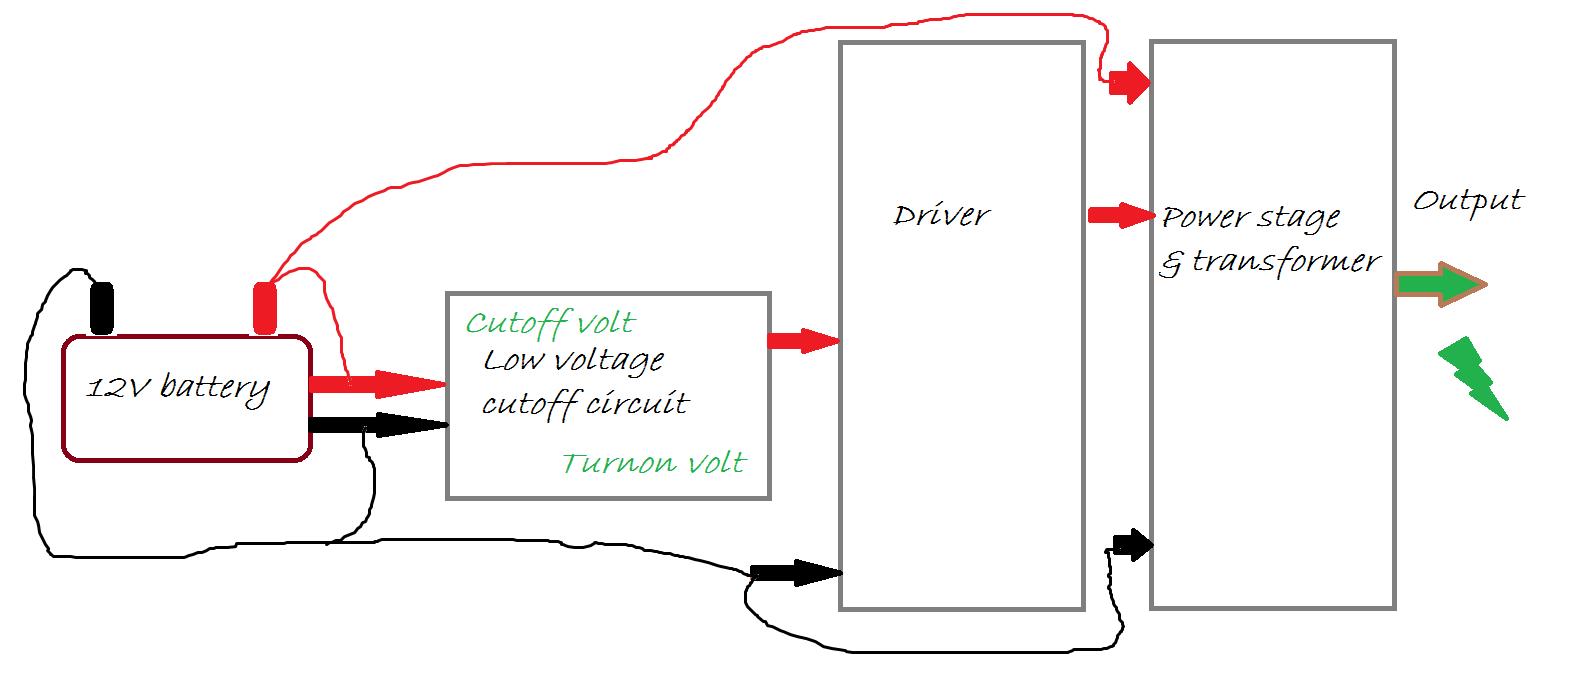 hight resolution of 12v inverter battery wiring diagram